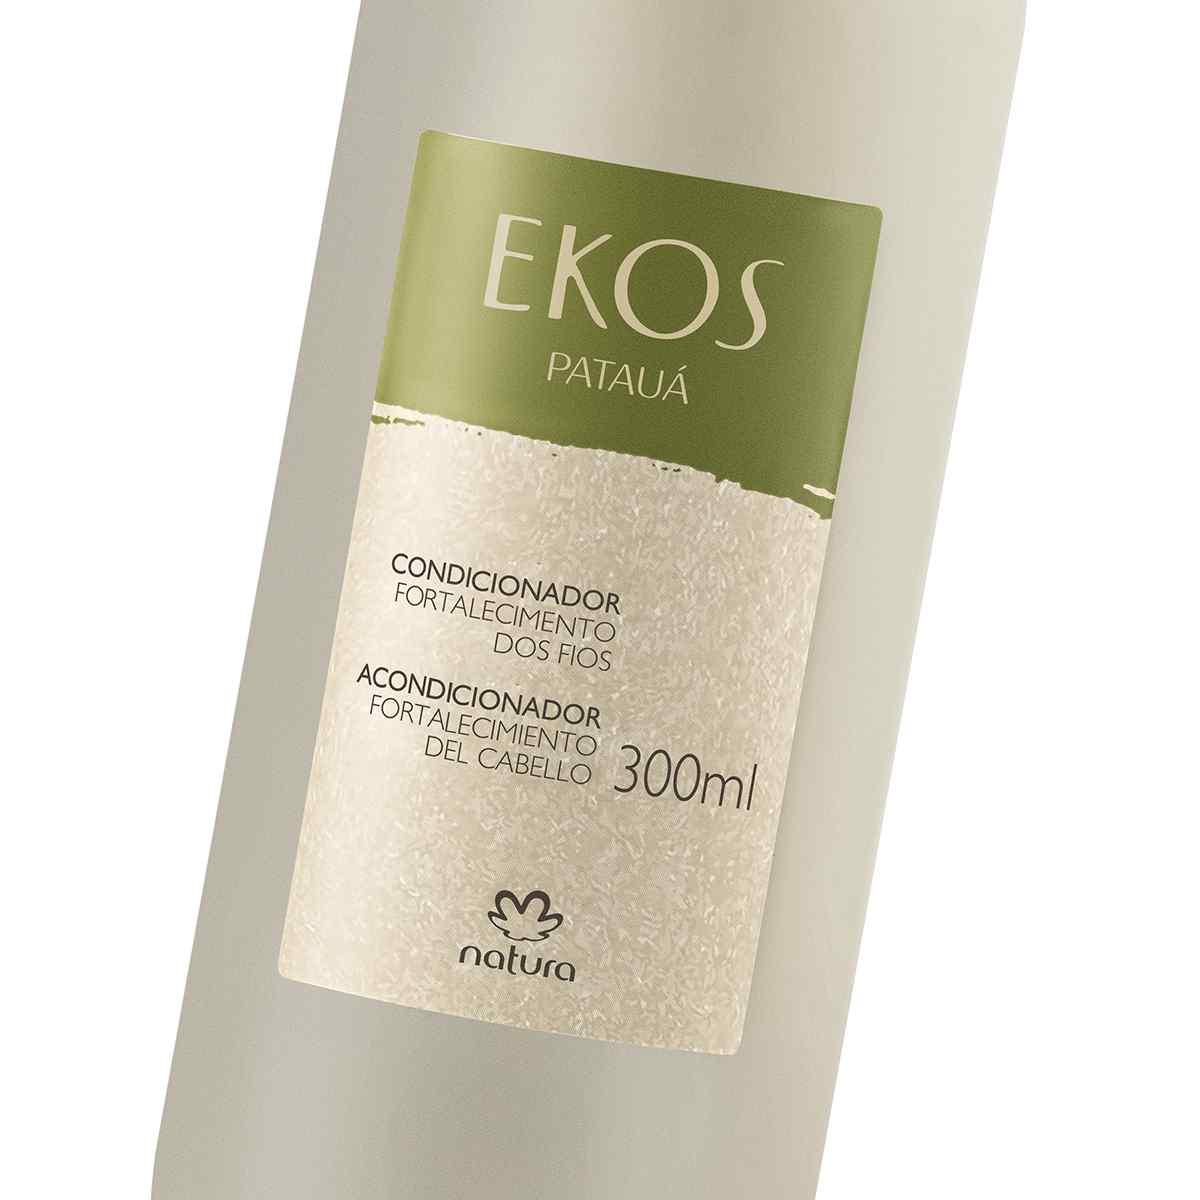 Condicionador Patauá Ekos - 300ml - 63373